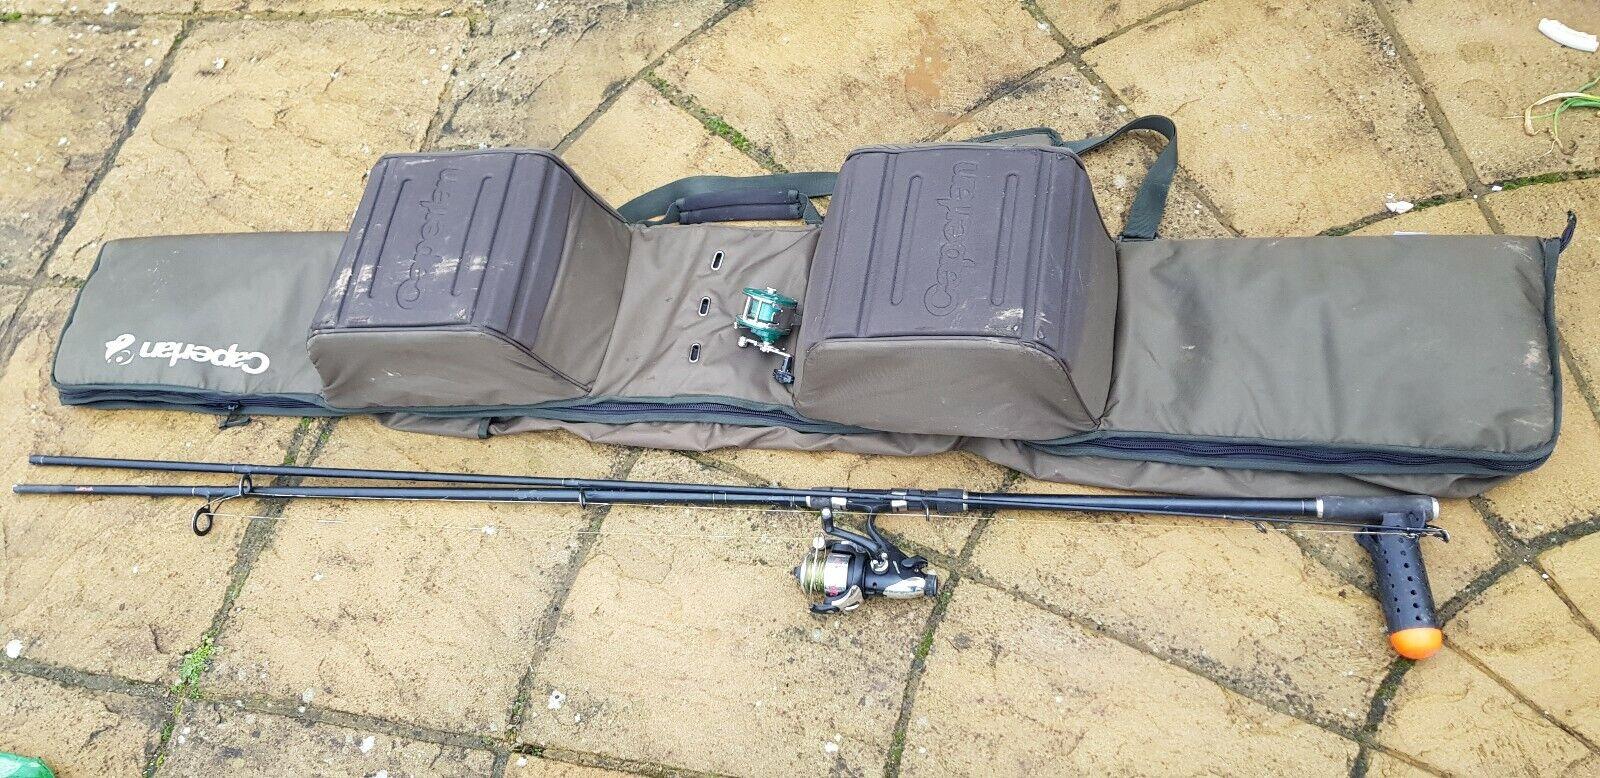 CAPERLAN CARP FISHING HOLDALL-5 4 ROD FISHING SLEEVE 13'